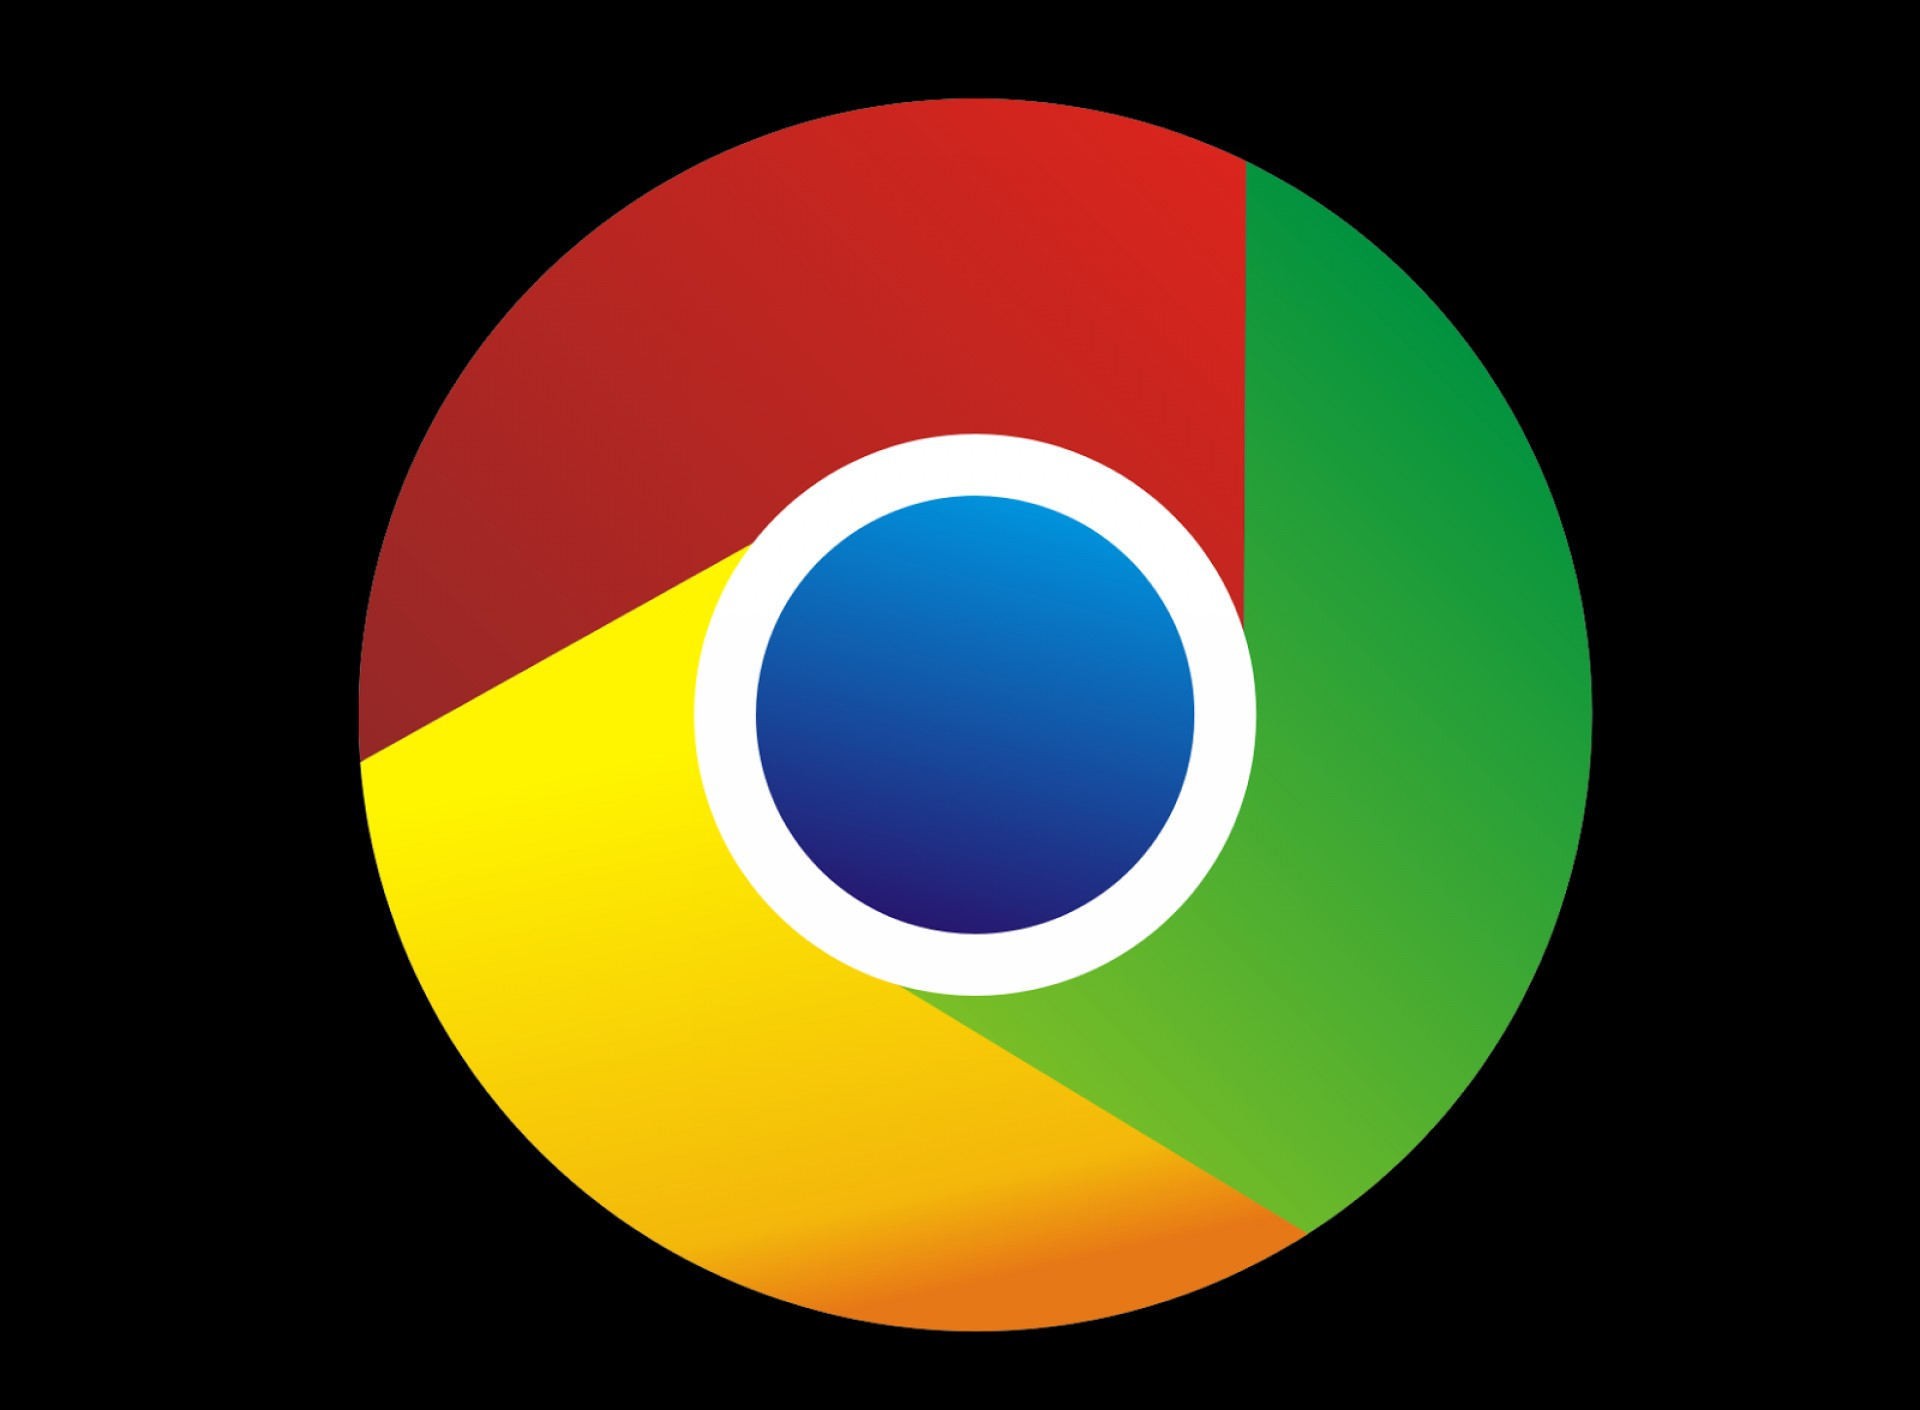 Google Chrome Logo Vector Png.